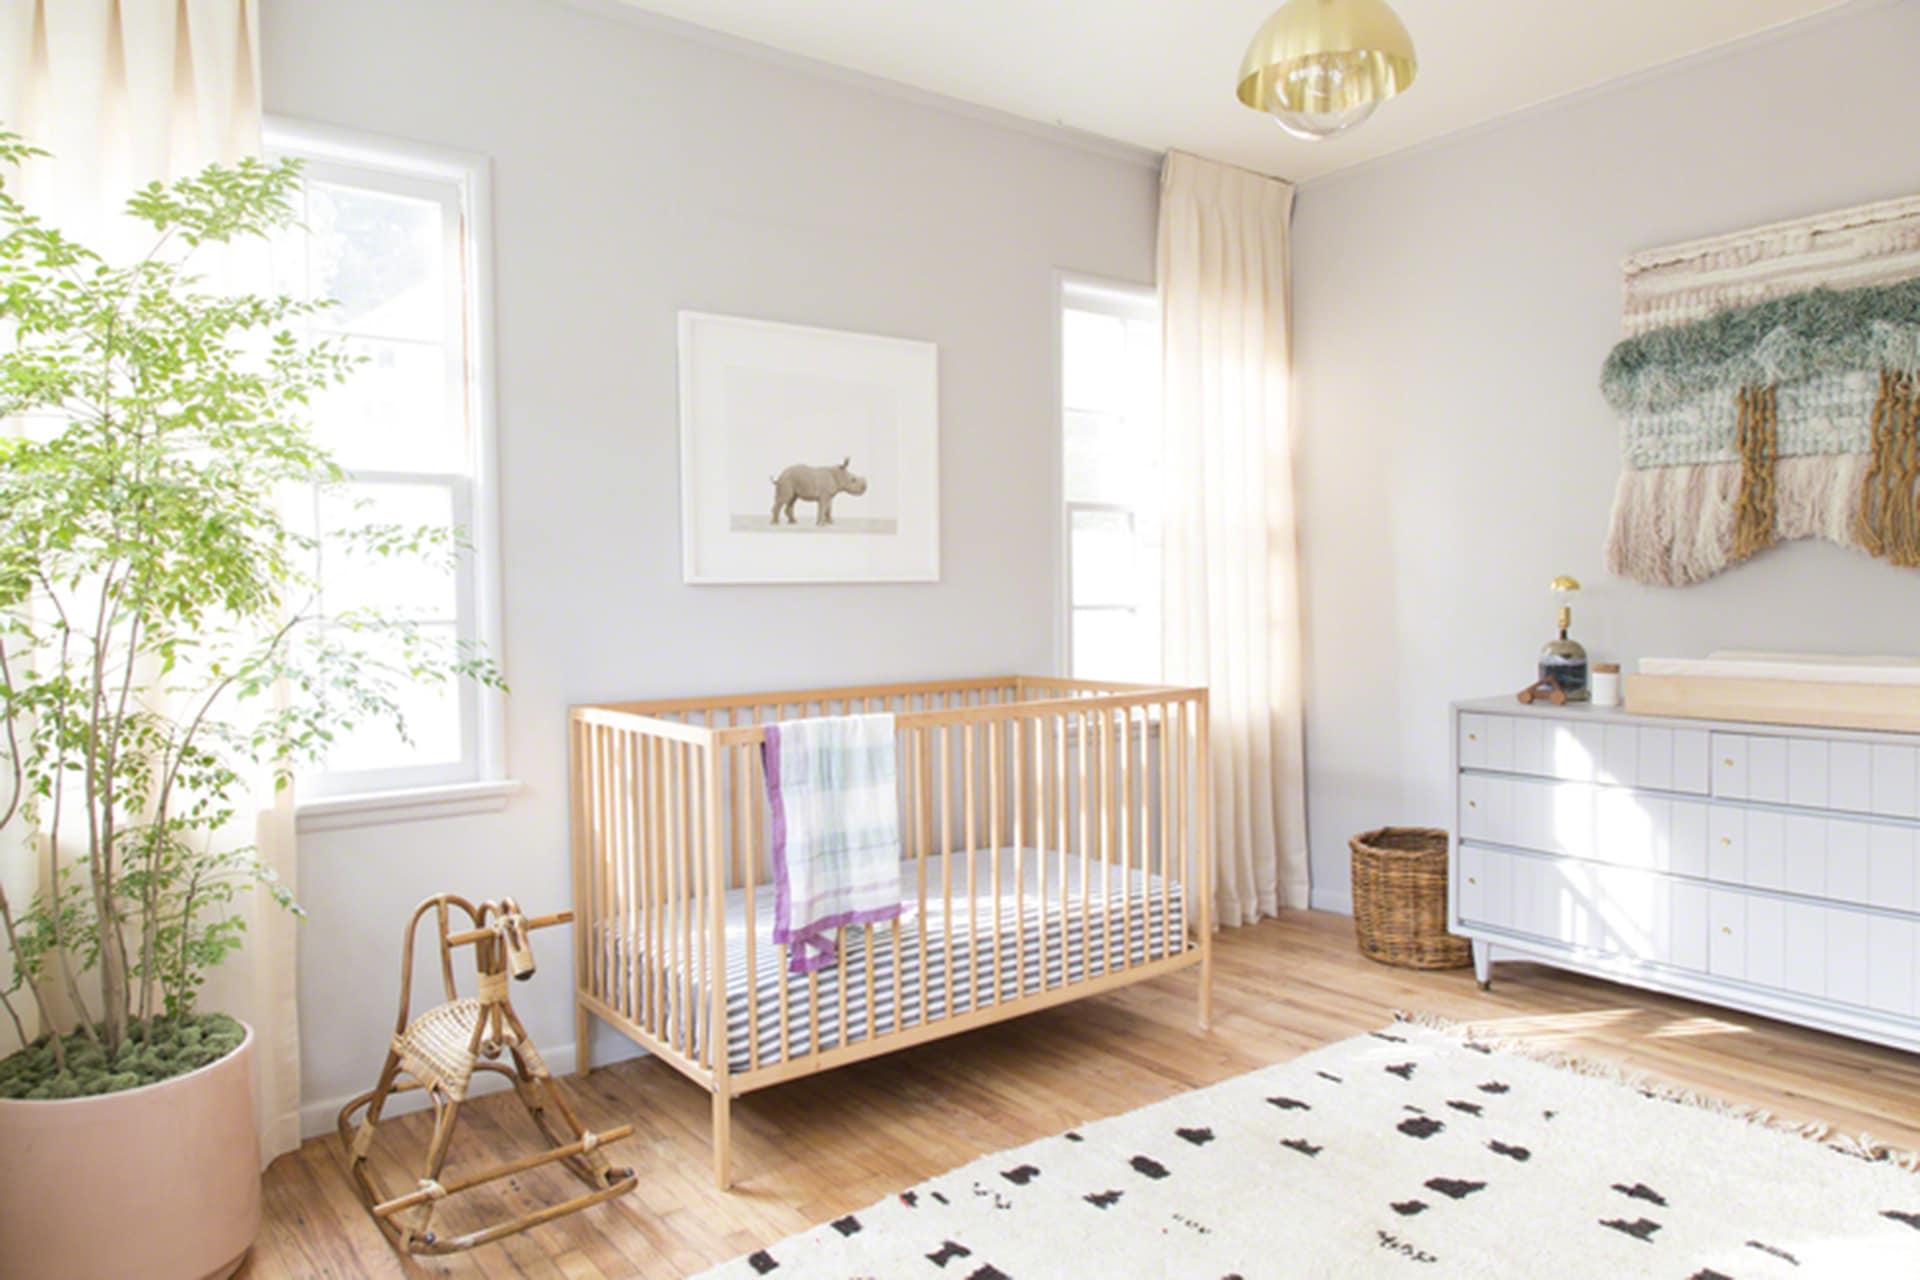 Galer a para decoraci n habitaci n de beb m s de 40 for Decoracion casa habitacion